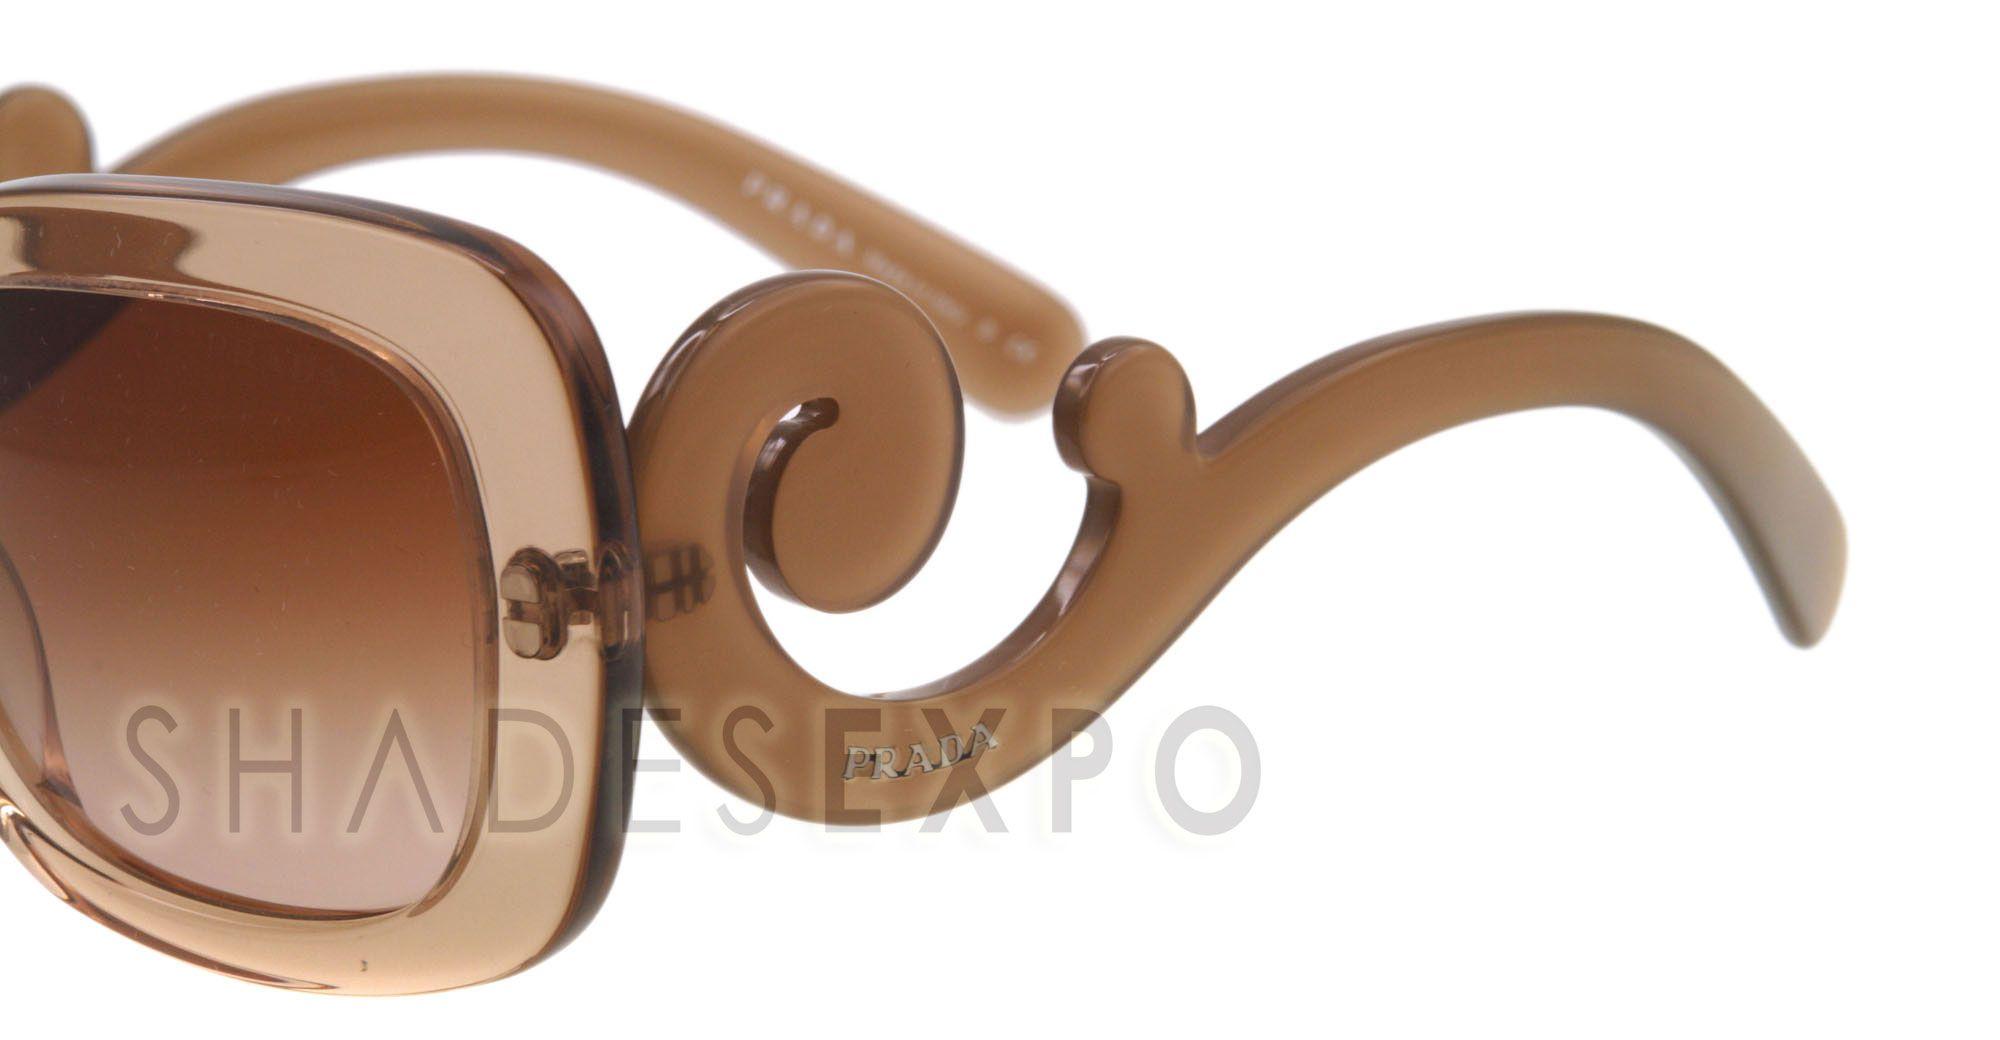 New Prada Sunglasses SPR 27O Brown Kal 1Z1 SPR27P 54mm